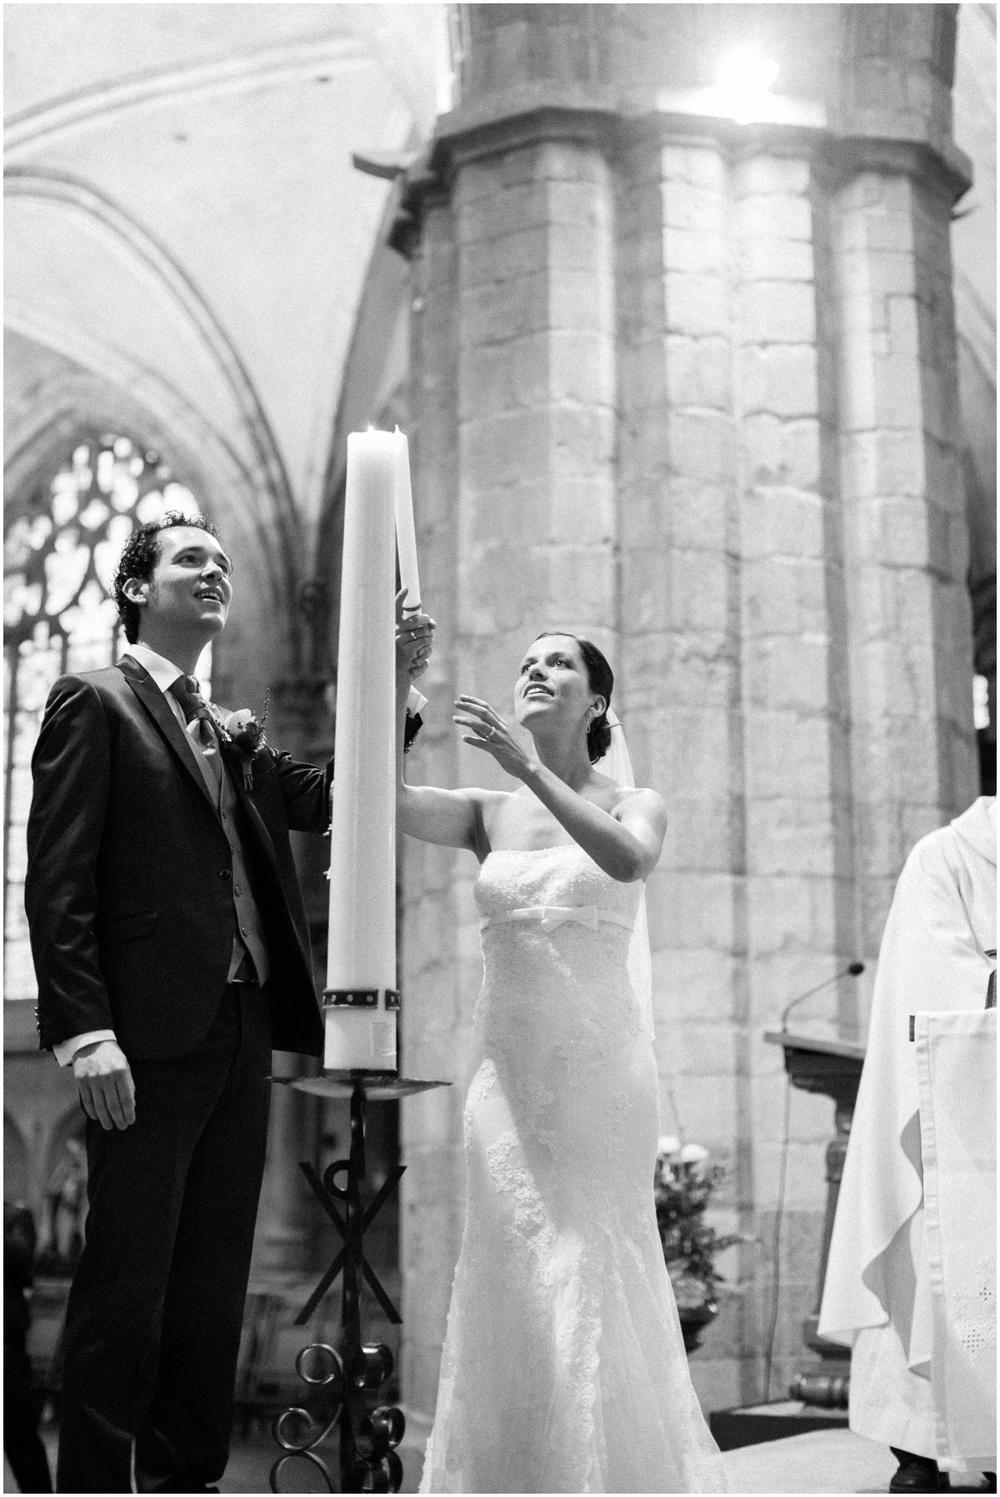 Church wedding in Hulst